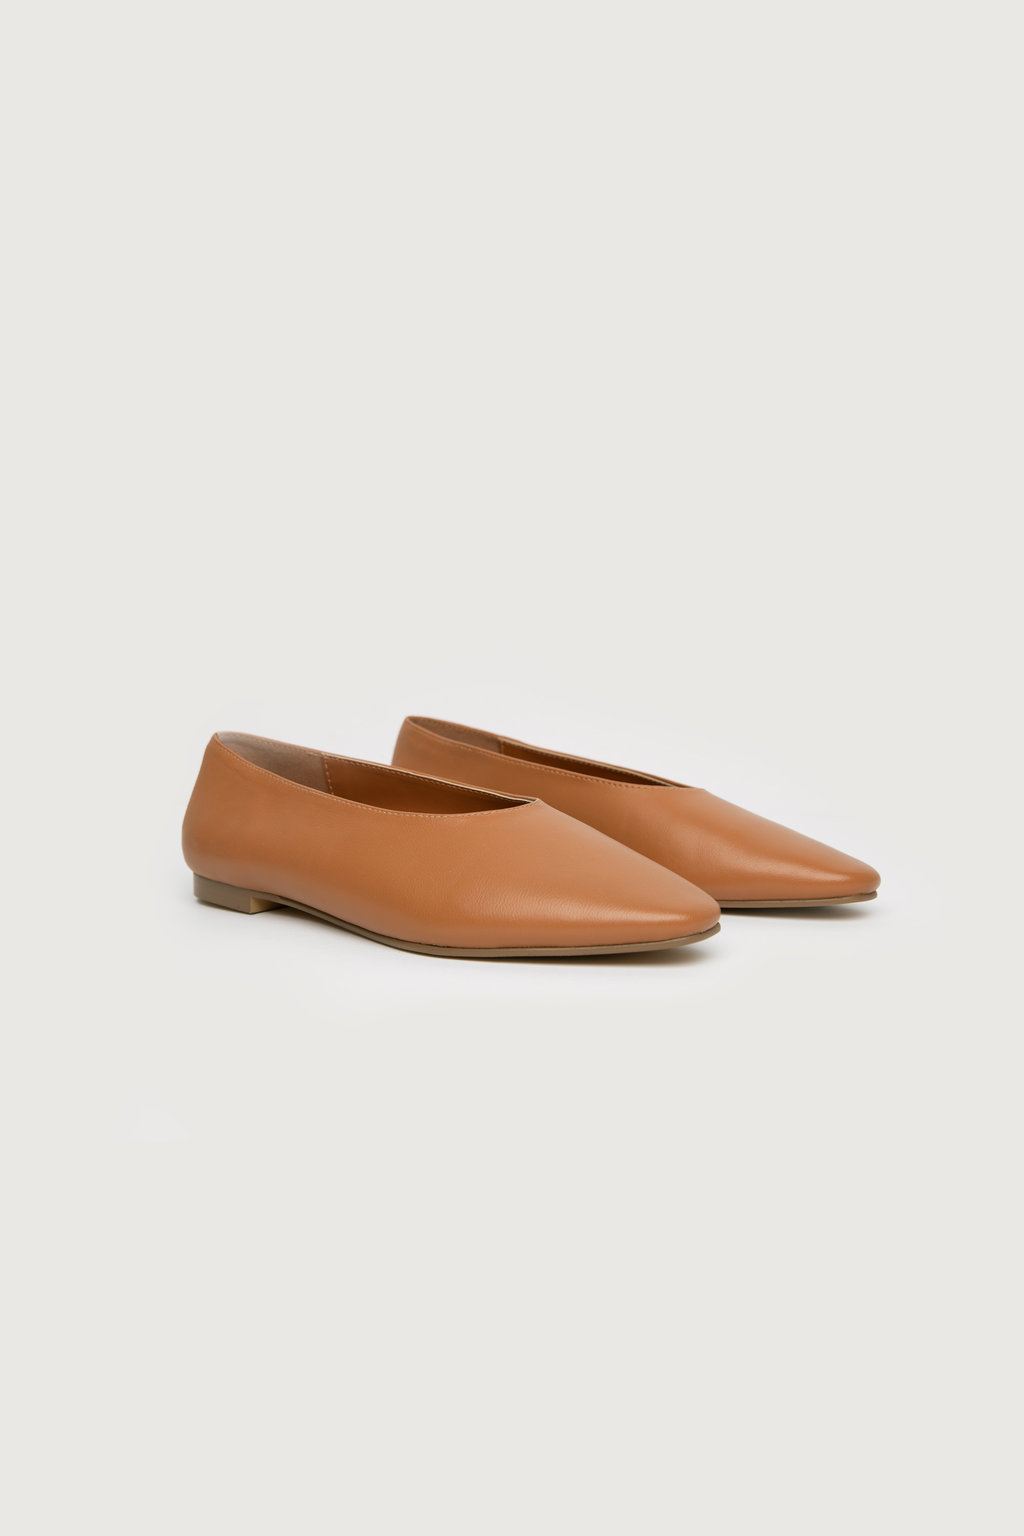 Flat 3358 Terracotta 1